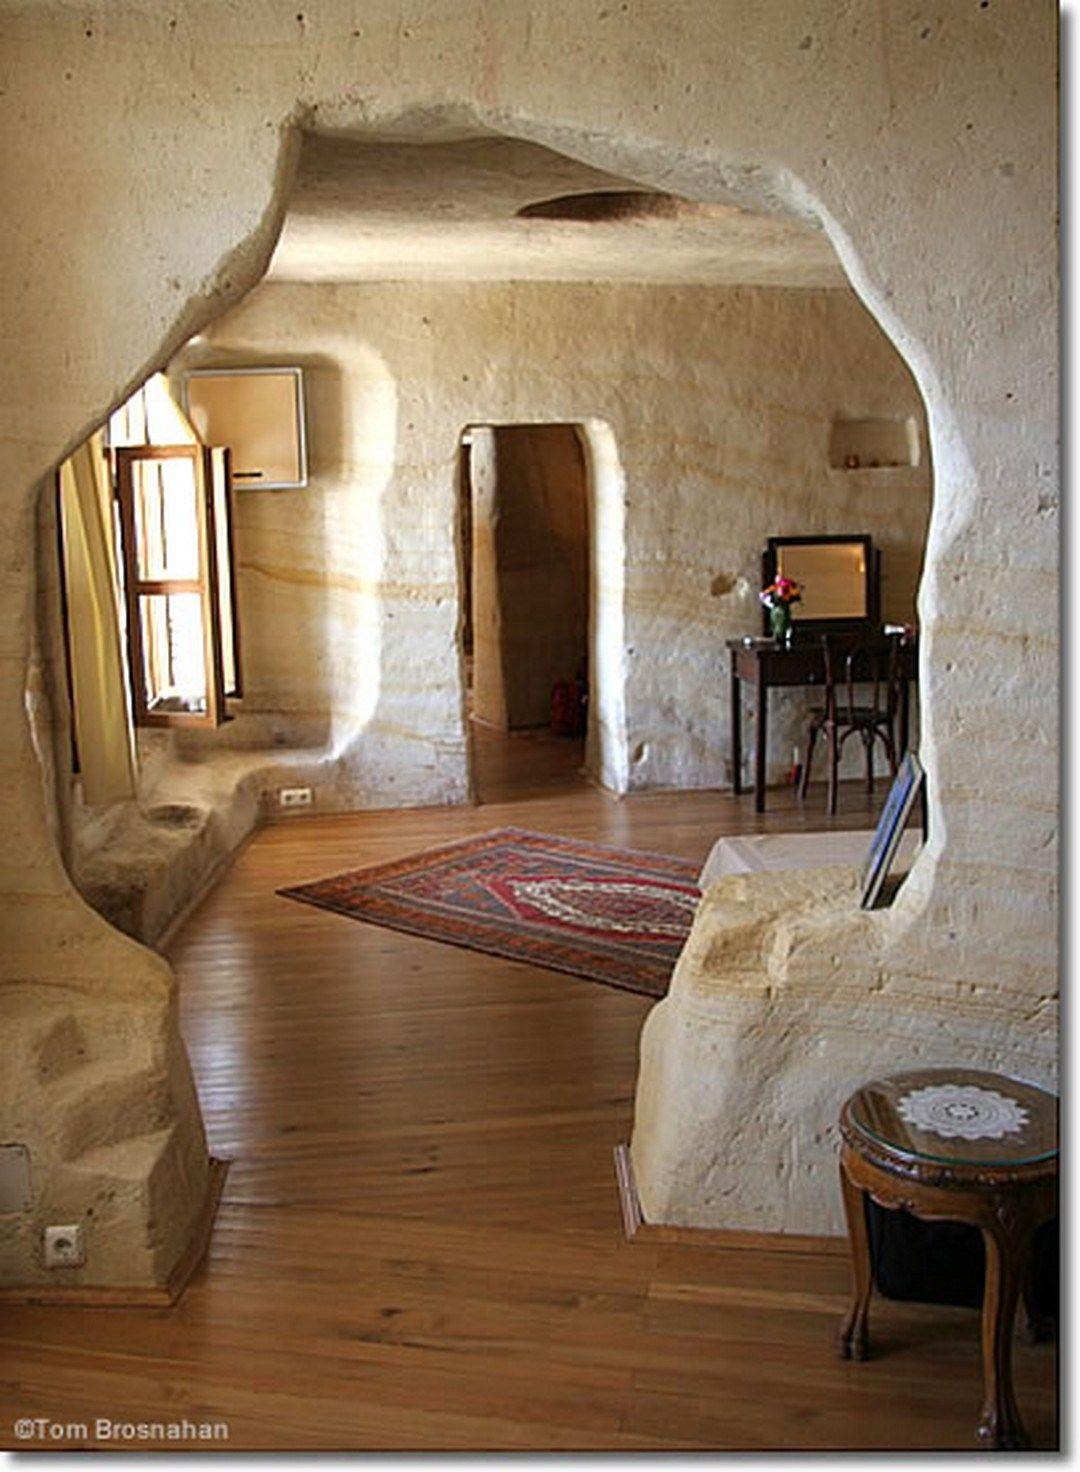 Cob House Interior Design Ideas 99 Stunning Photos (17) | Cob ...